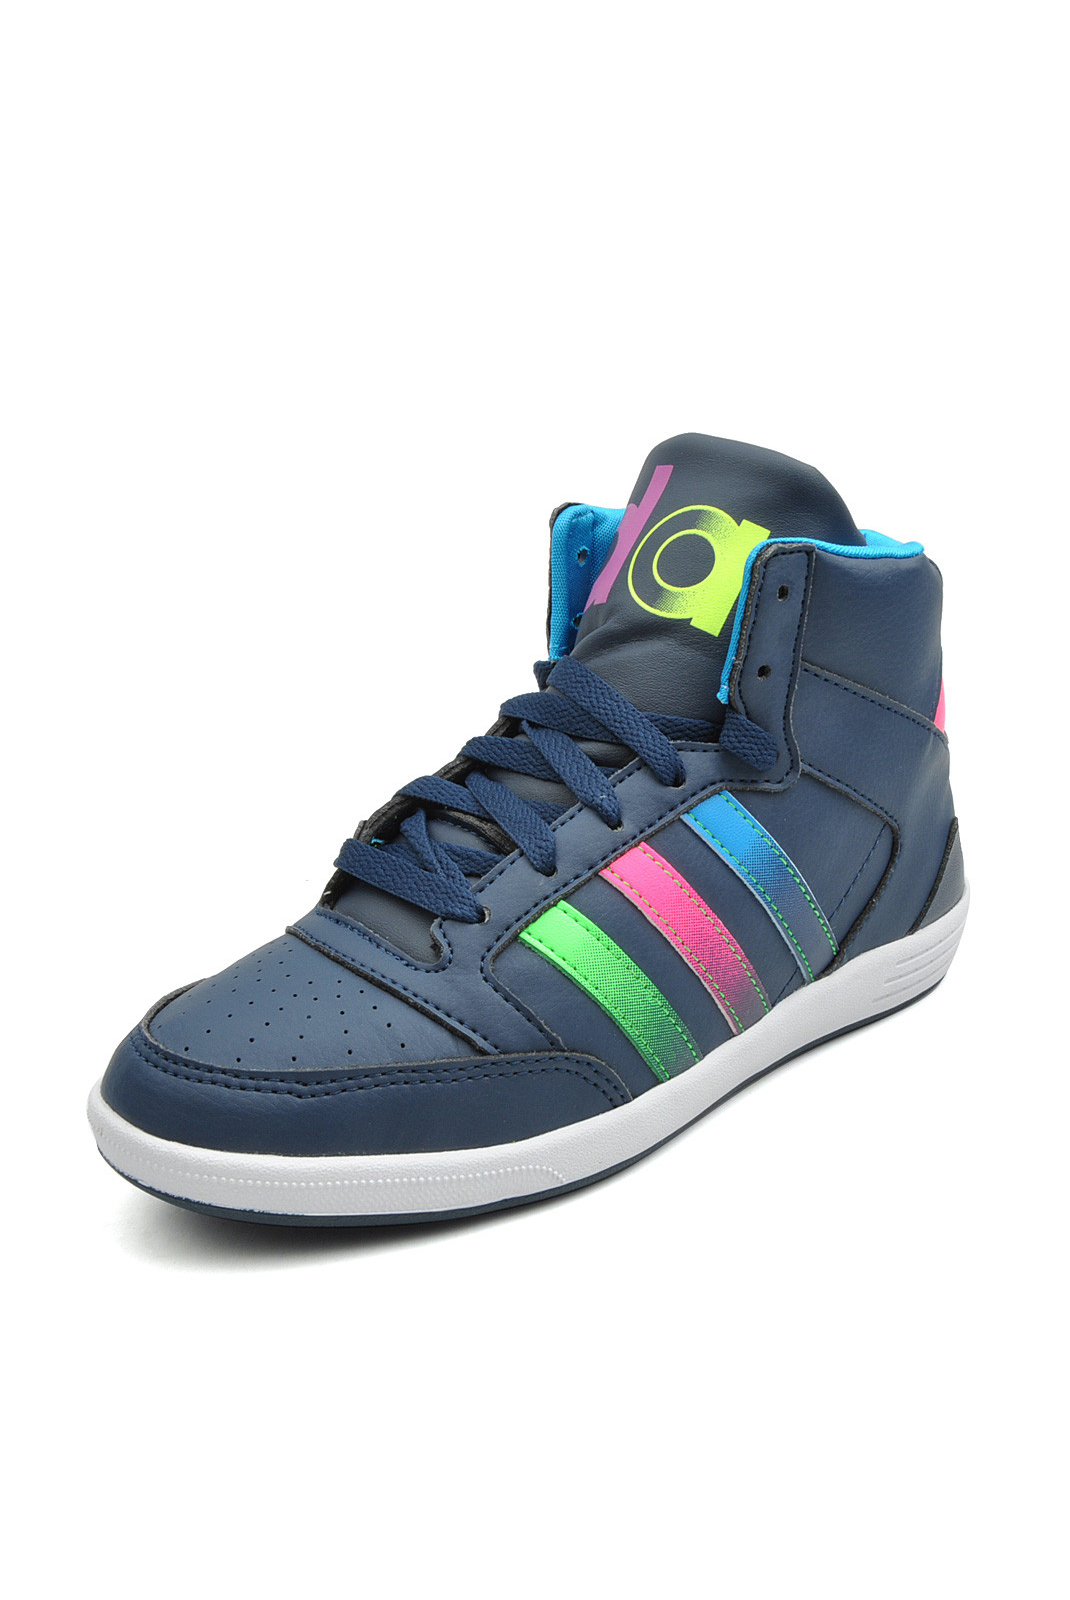 Baskets / Sneakers  Adidas F98643 HOOPS CST STREET W NAVY